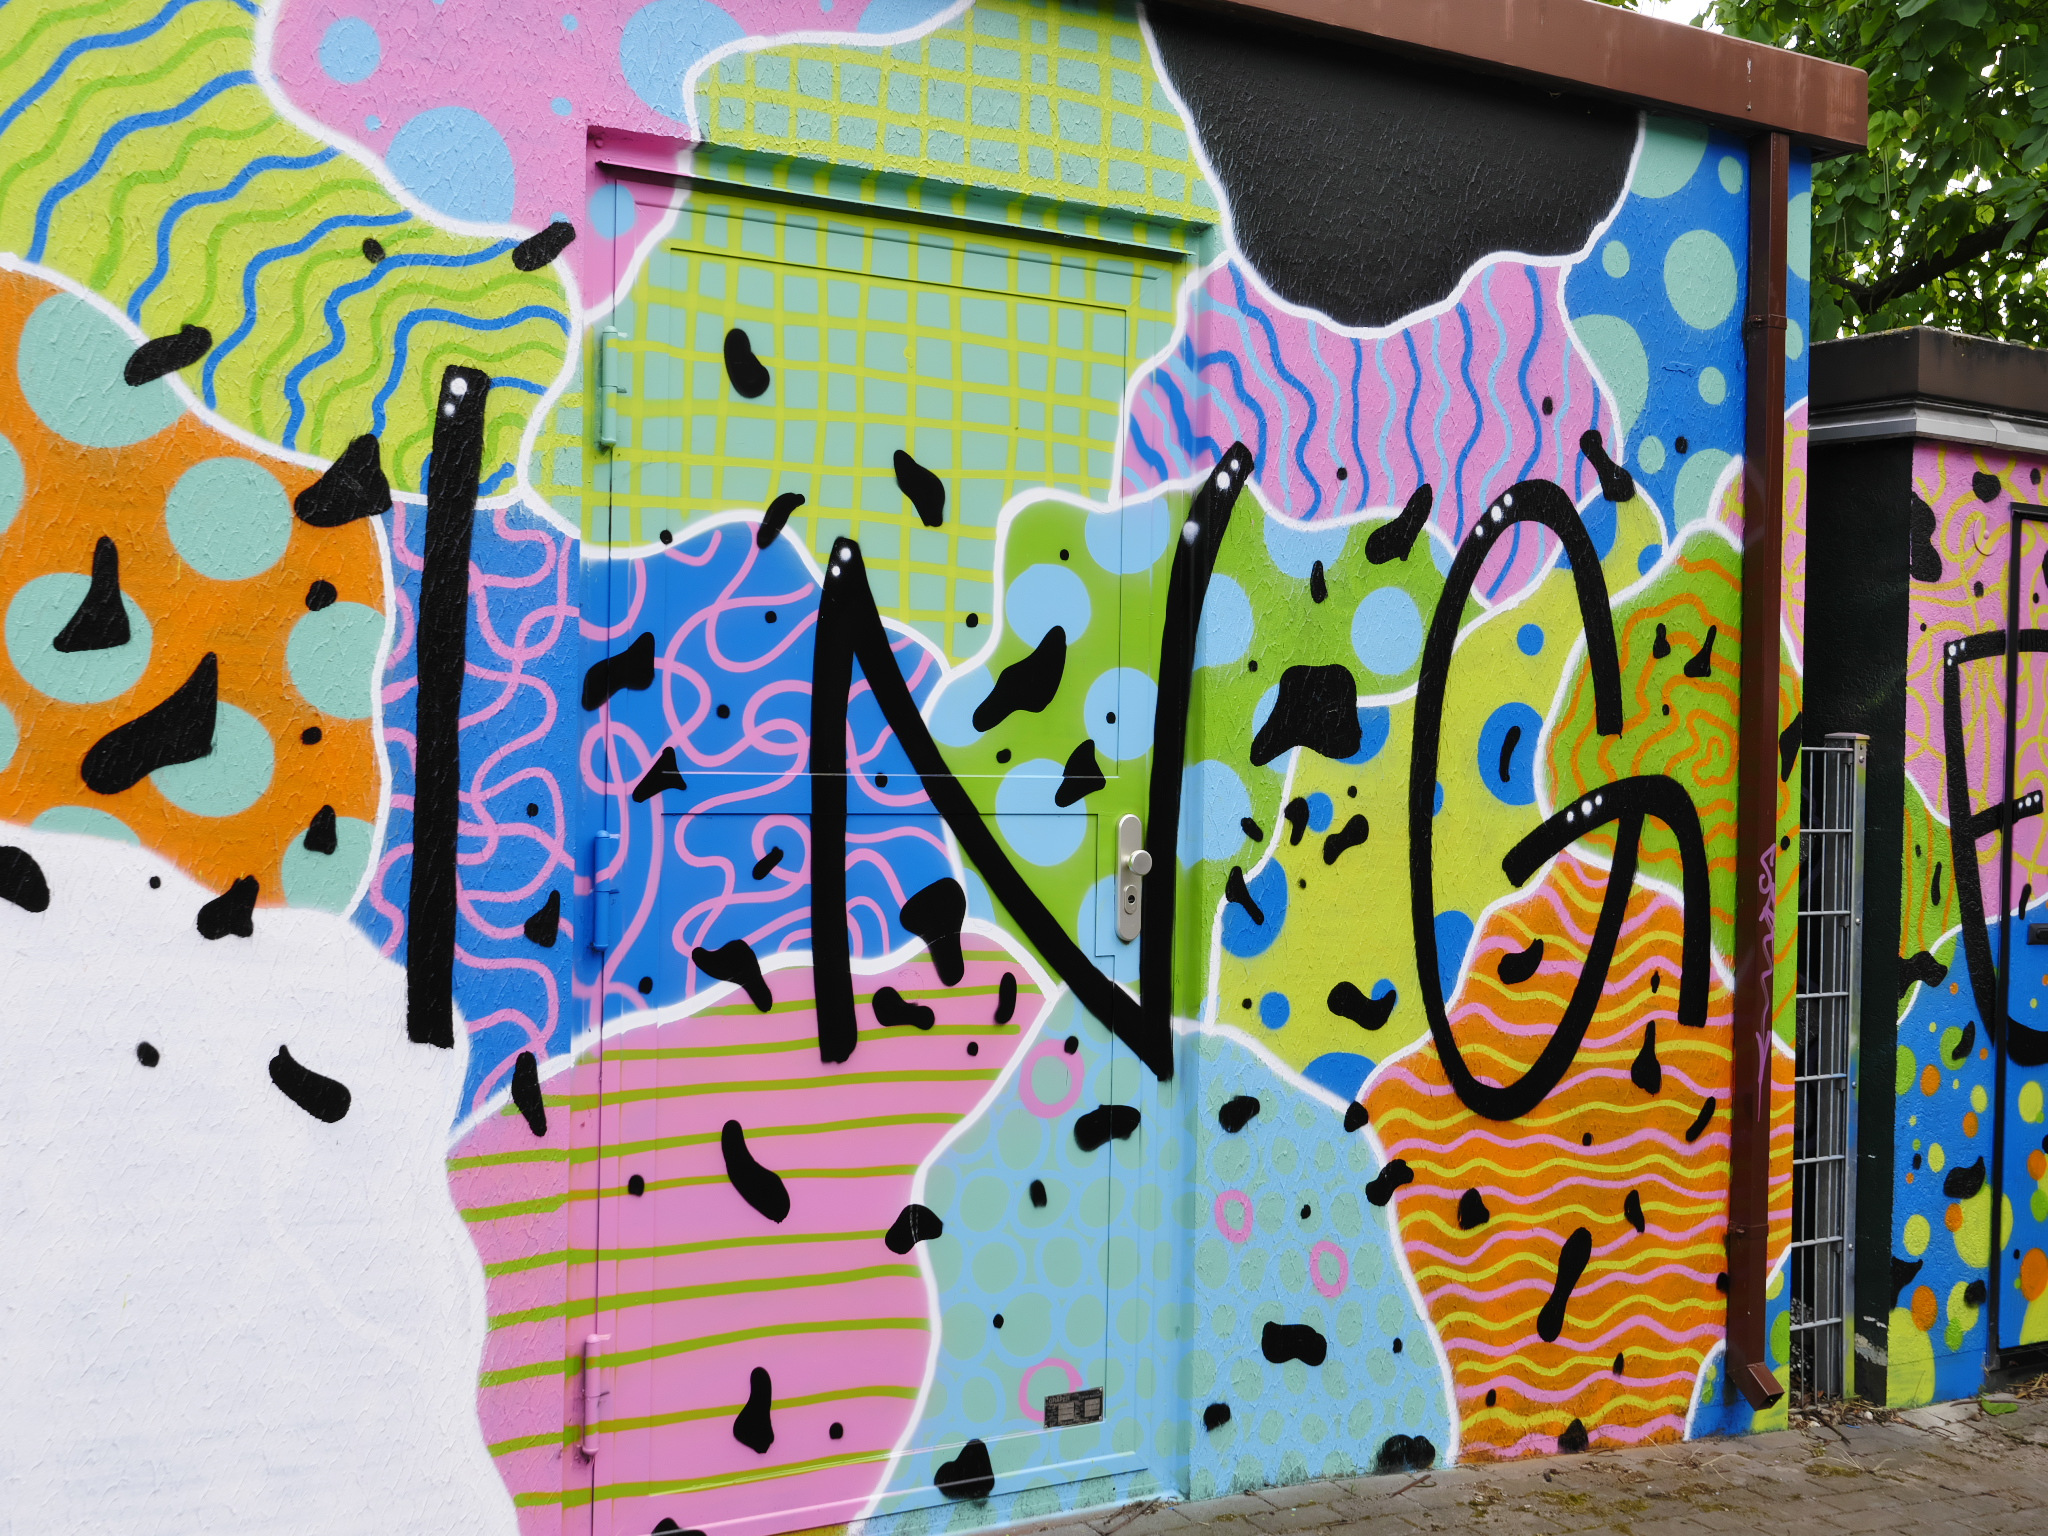 jugendkulturjahr-2020-ratingen-jkj2020-graffiti-trafohaeuschen-stadtwerke-Bild08